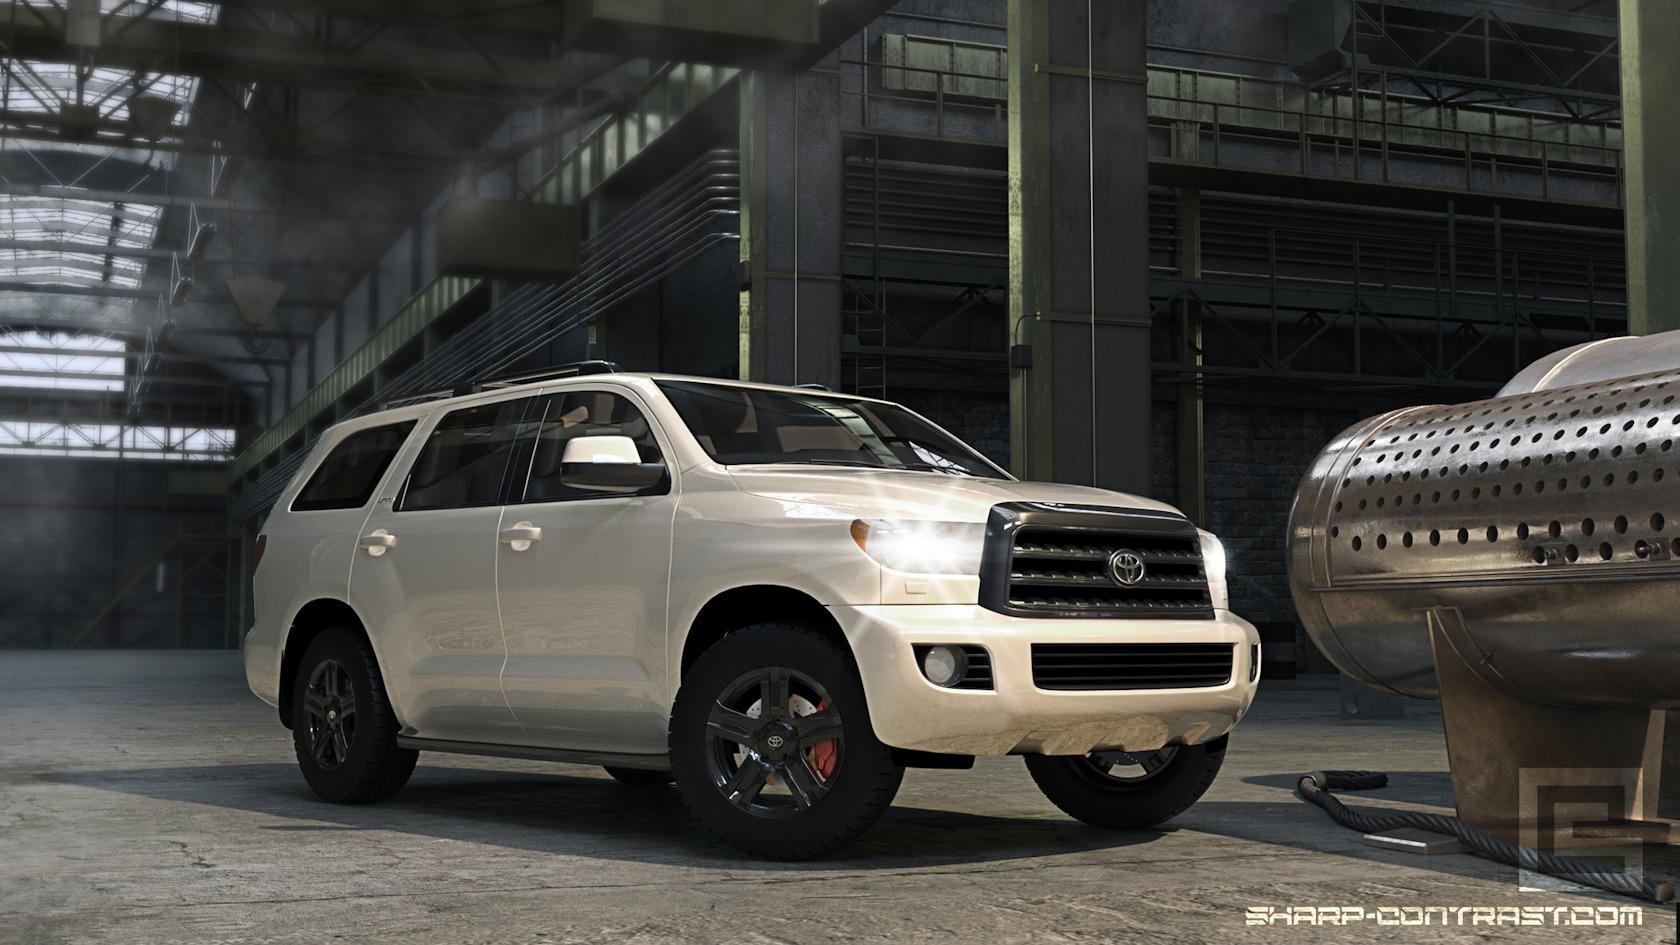 Toyota realictic render sharp contrast